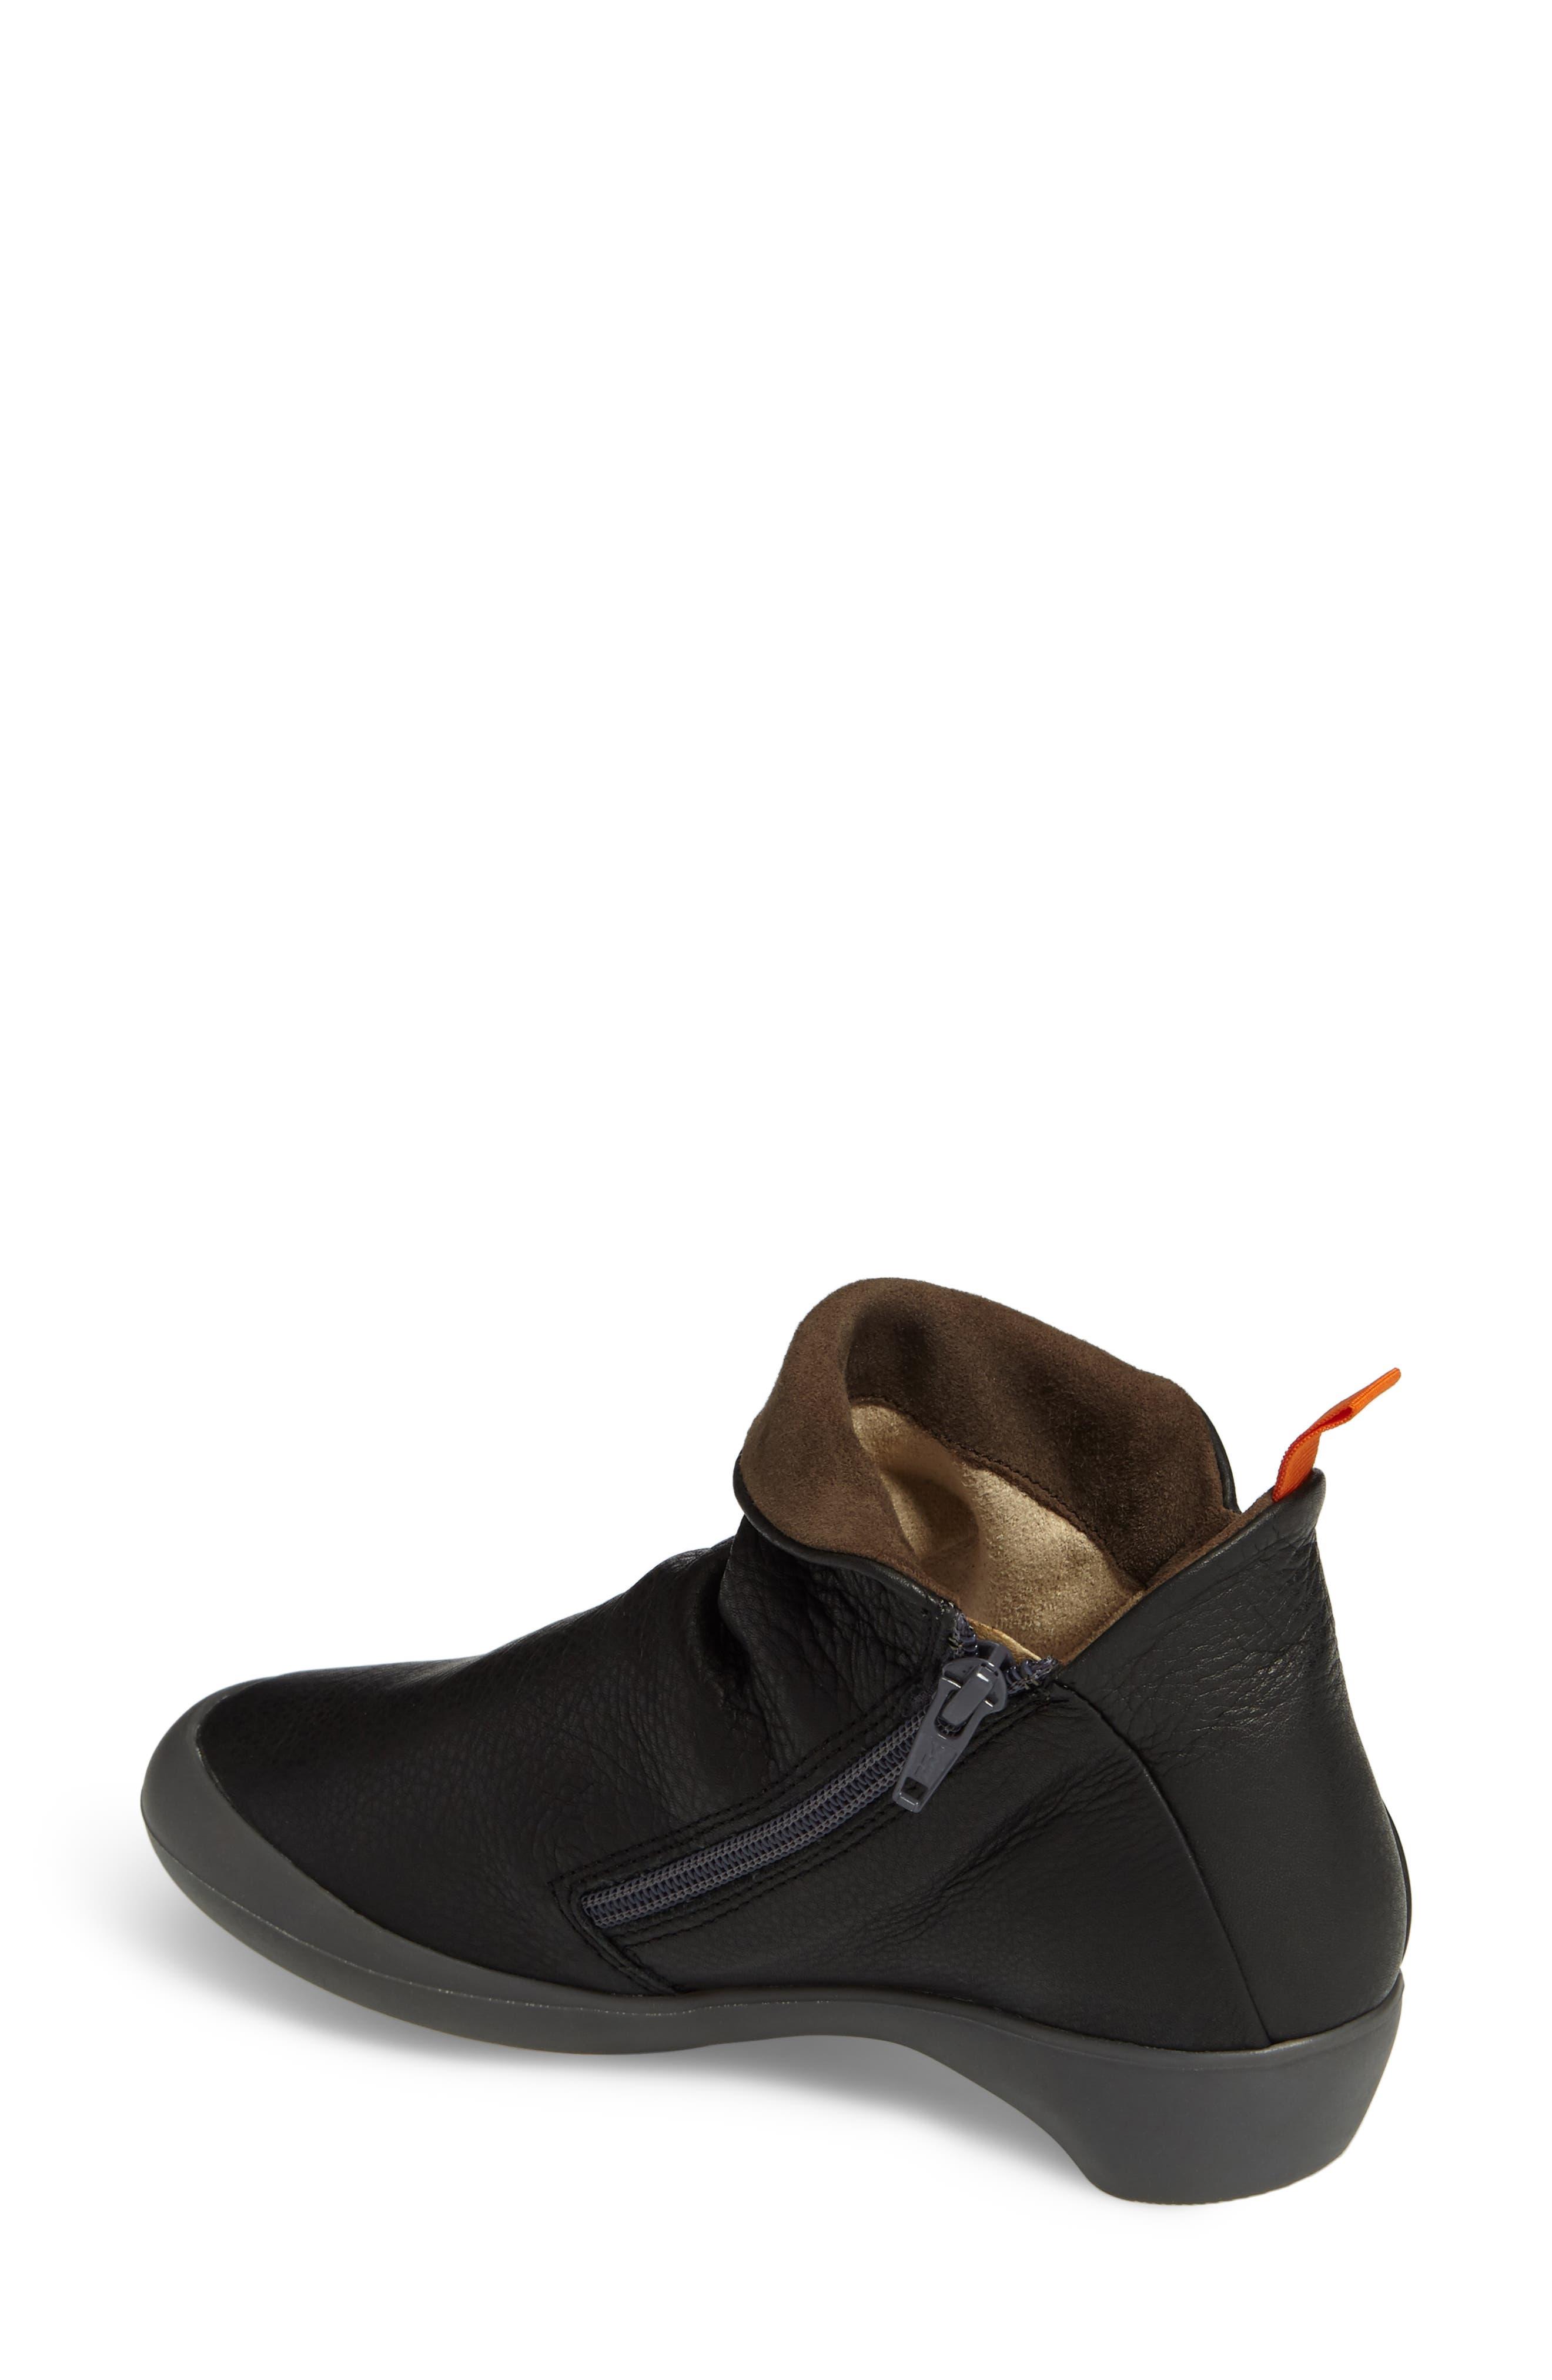 Farah Bootie,                             Alternate thumbnail 2, color,                             Black/ Brown Leather